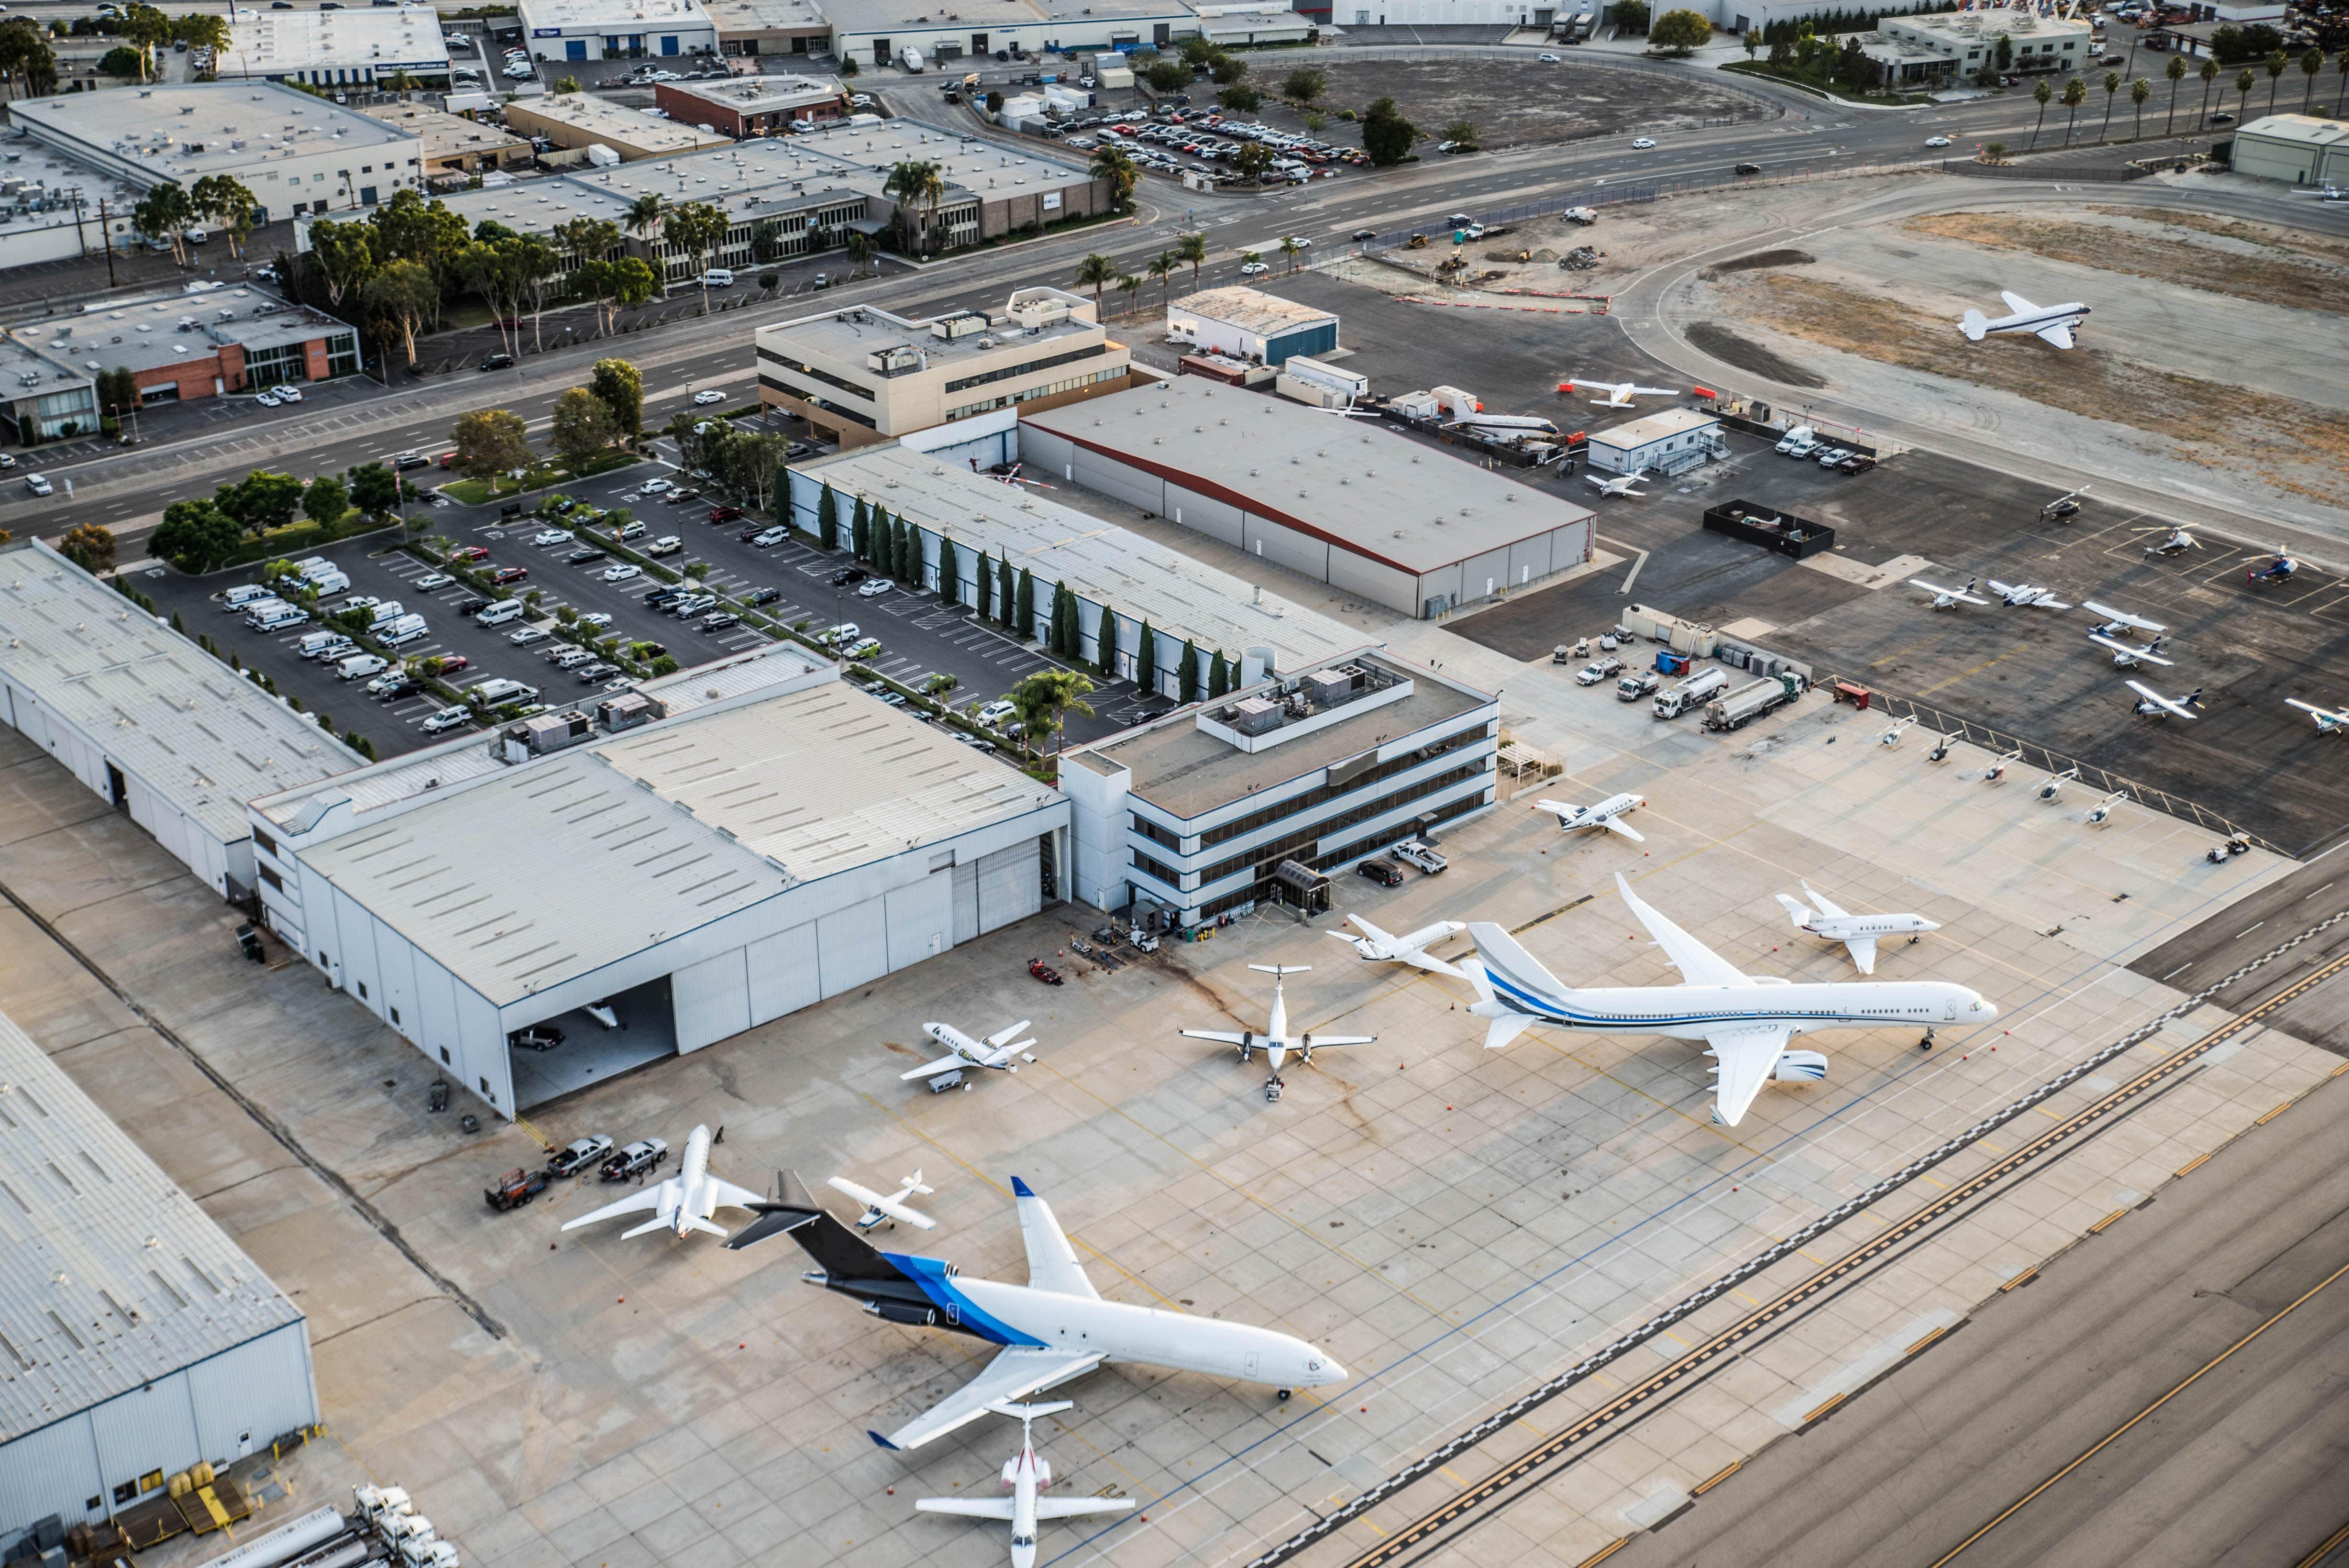 FA-for-airports-image-2-min